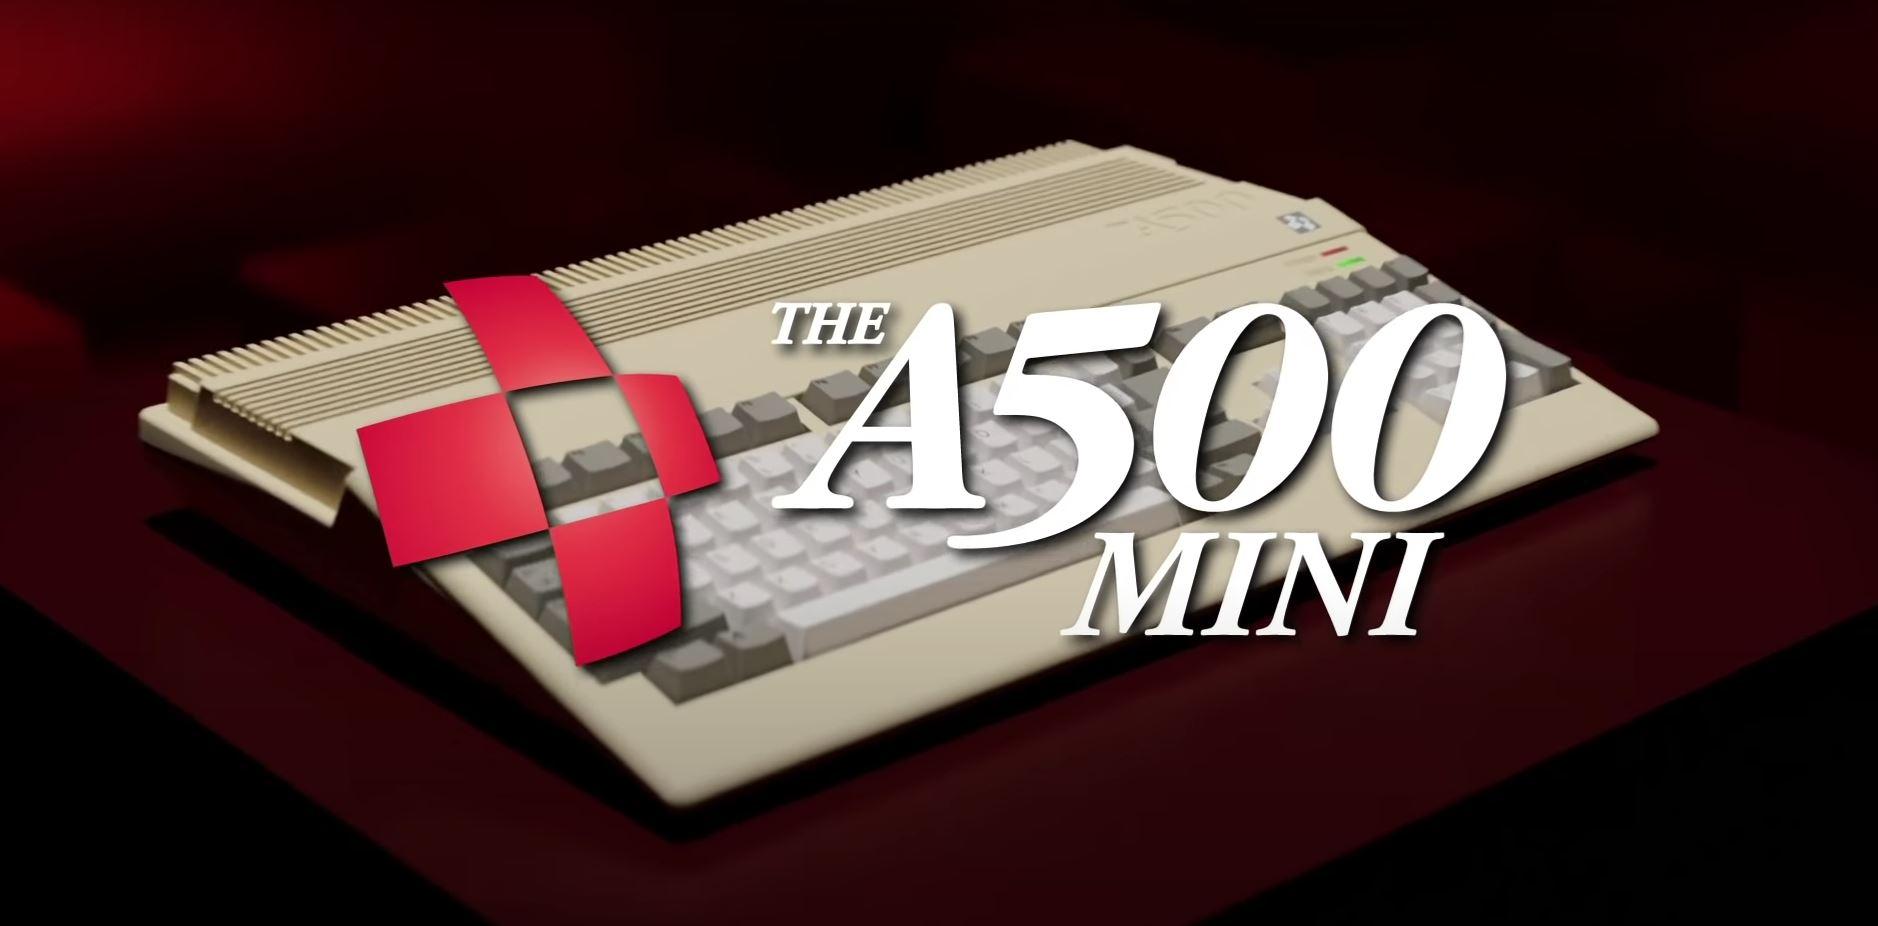 Amiga Reloaded — der A500 Mini kommt auf den Markt